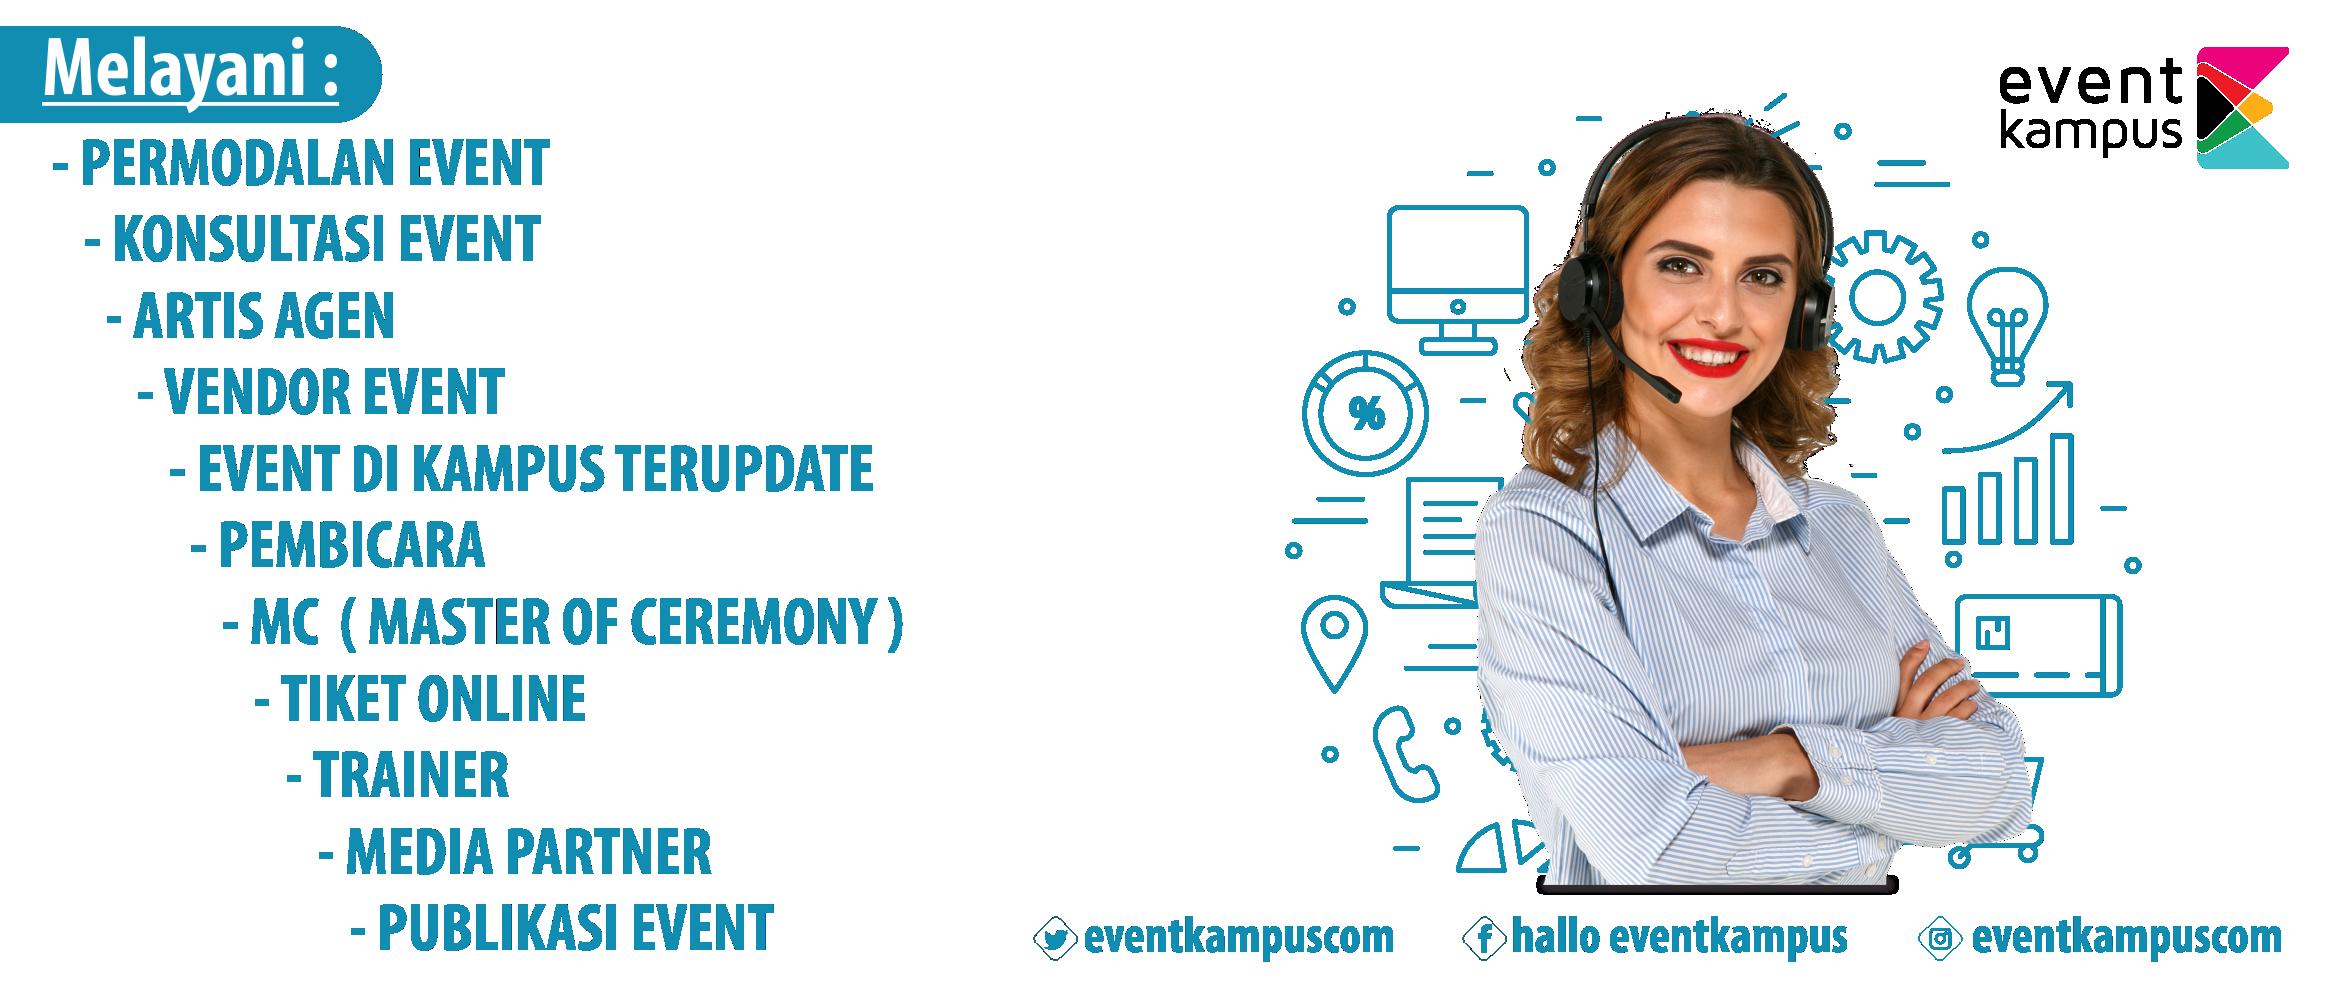 Company Profil Eventkampus.com